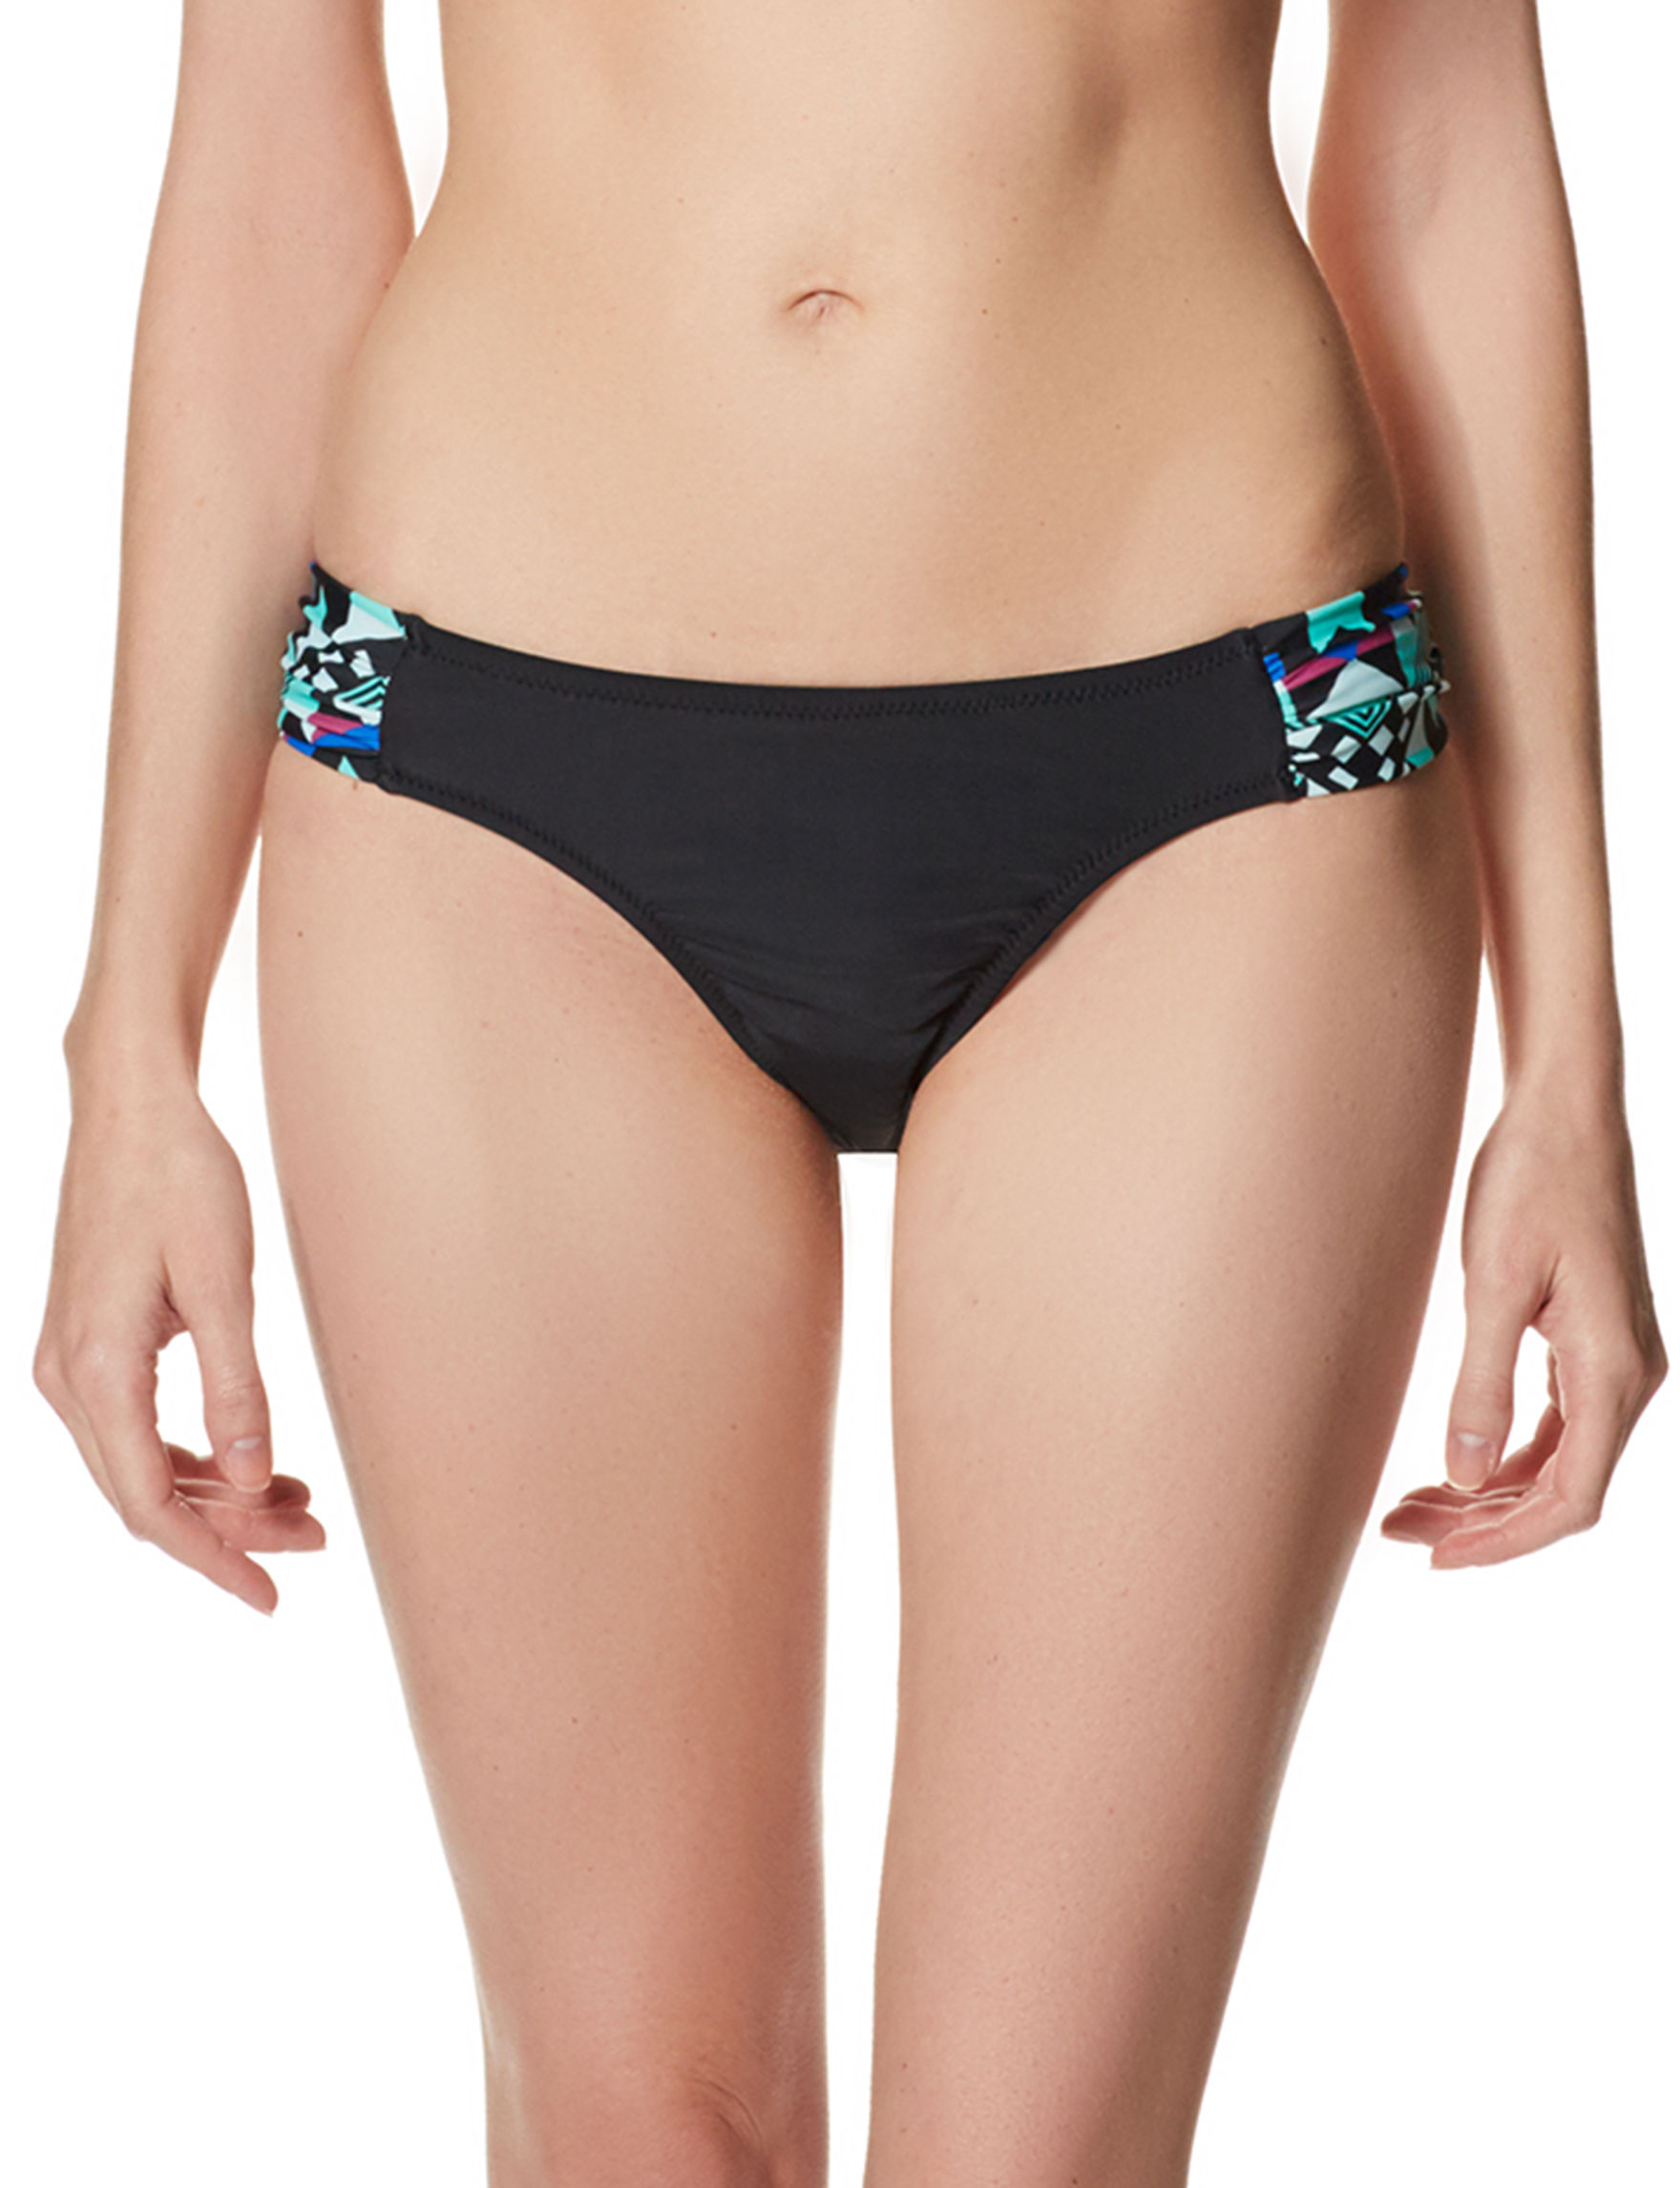 Pink Envelope Black Swimsuit Bottoms Hipster